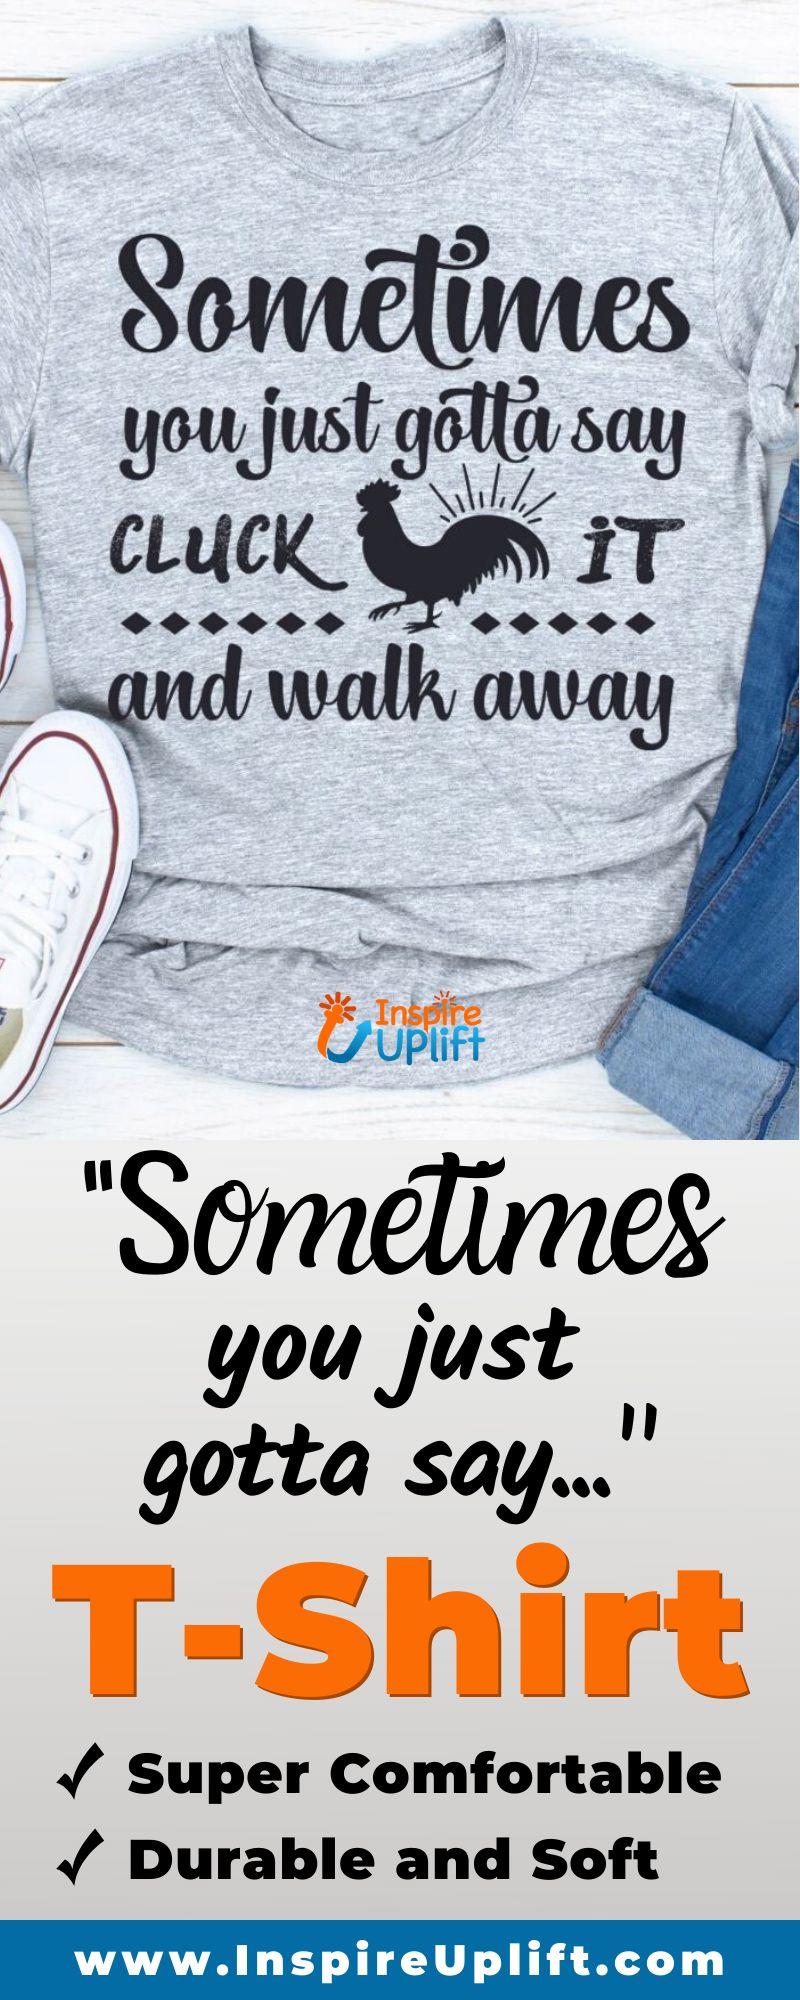 Sometimes You Just Gotta Say... T-Shirt 😍 InspireUplift.com